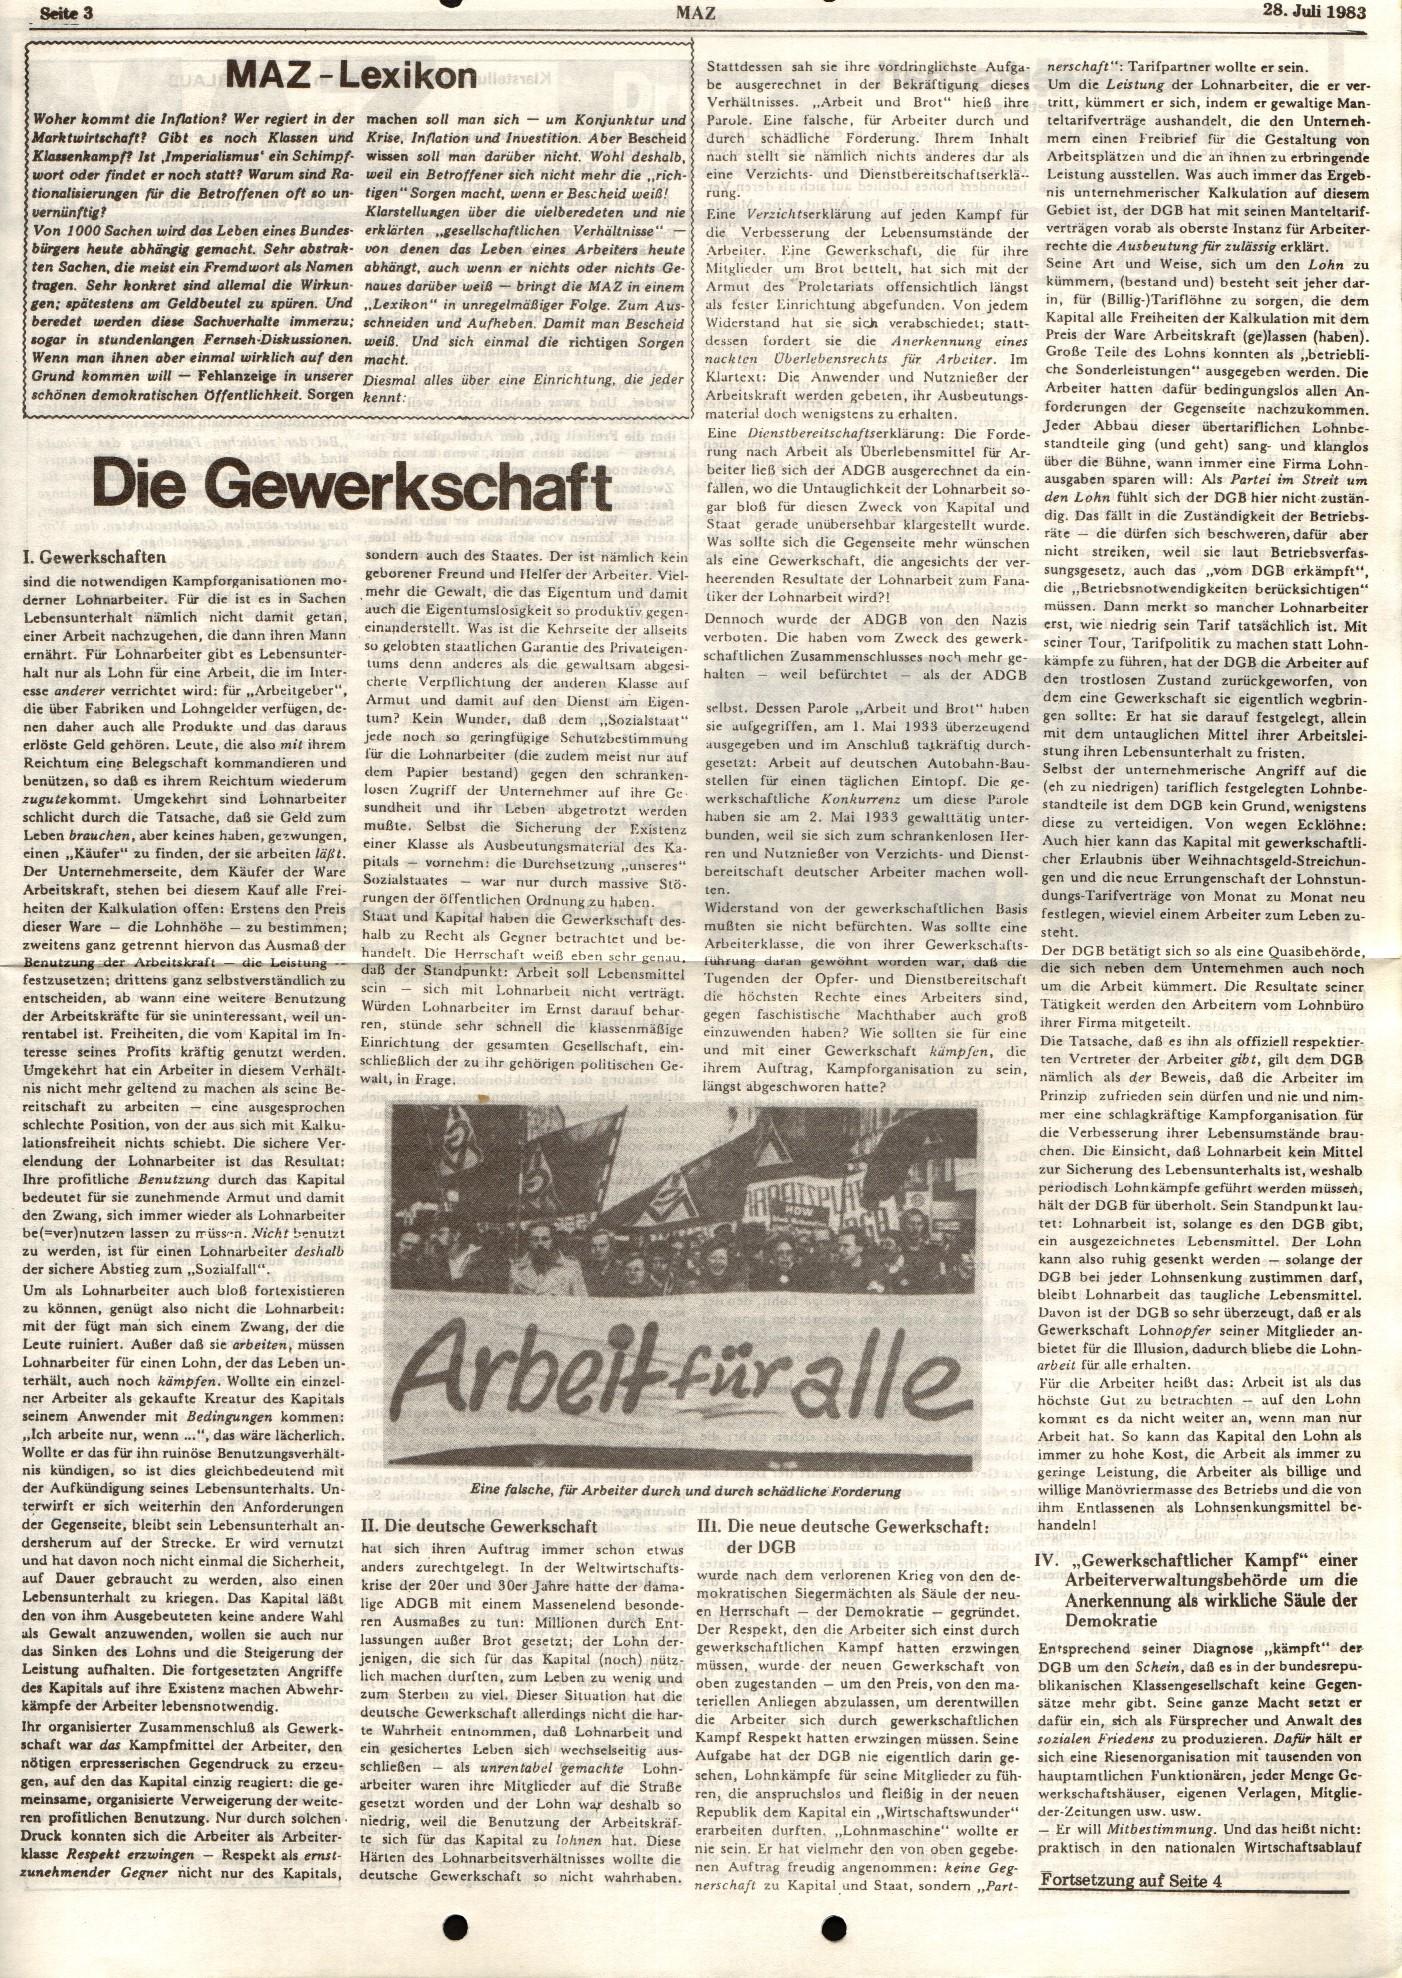 Hamburg_MG_MAZ_Druck_19830728_03